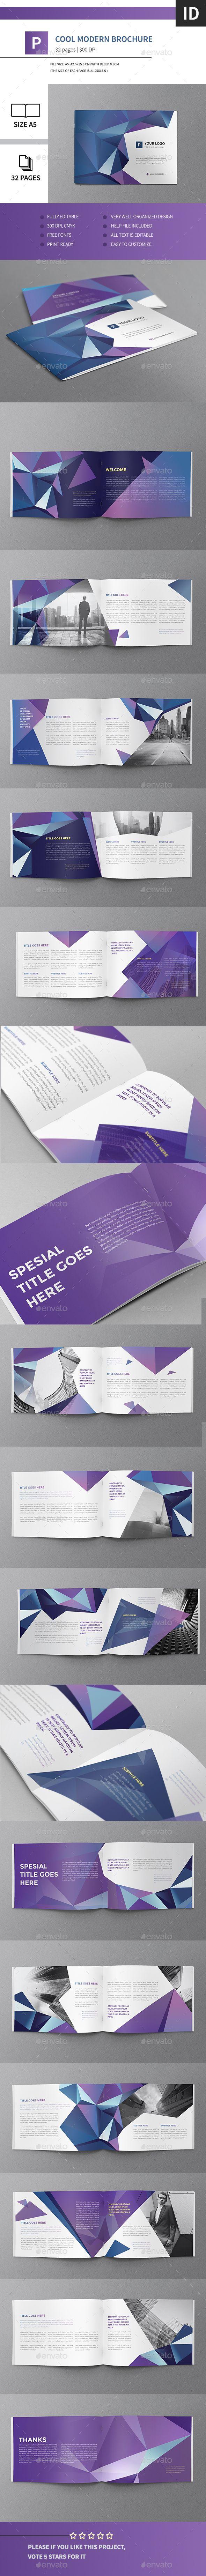 Cool Modern Brochure 32 Pages A5 Horizontal Template InDesign INDD #design Download: http://graphicriver.net/item/cool-modern-brochure-32-pages-a5-horizontal/13653304?ref=ksioks